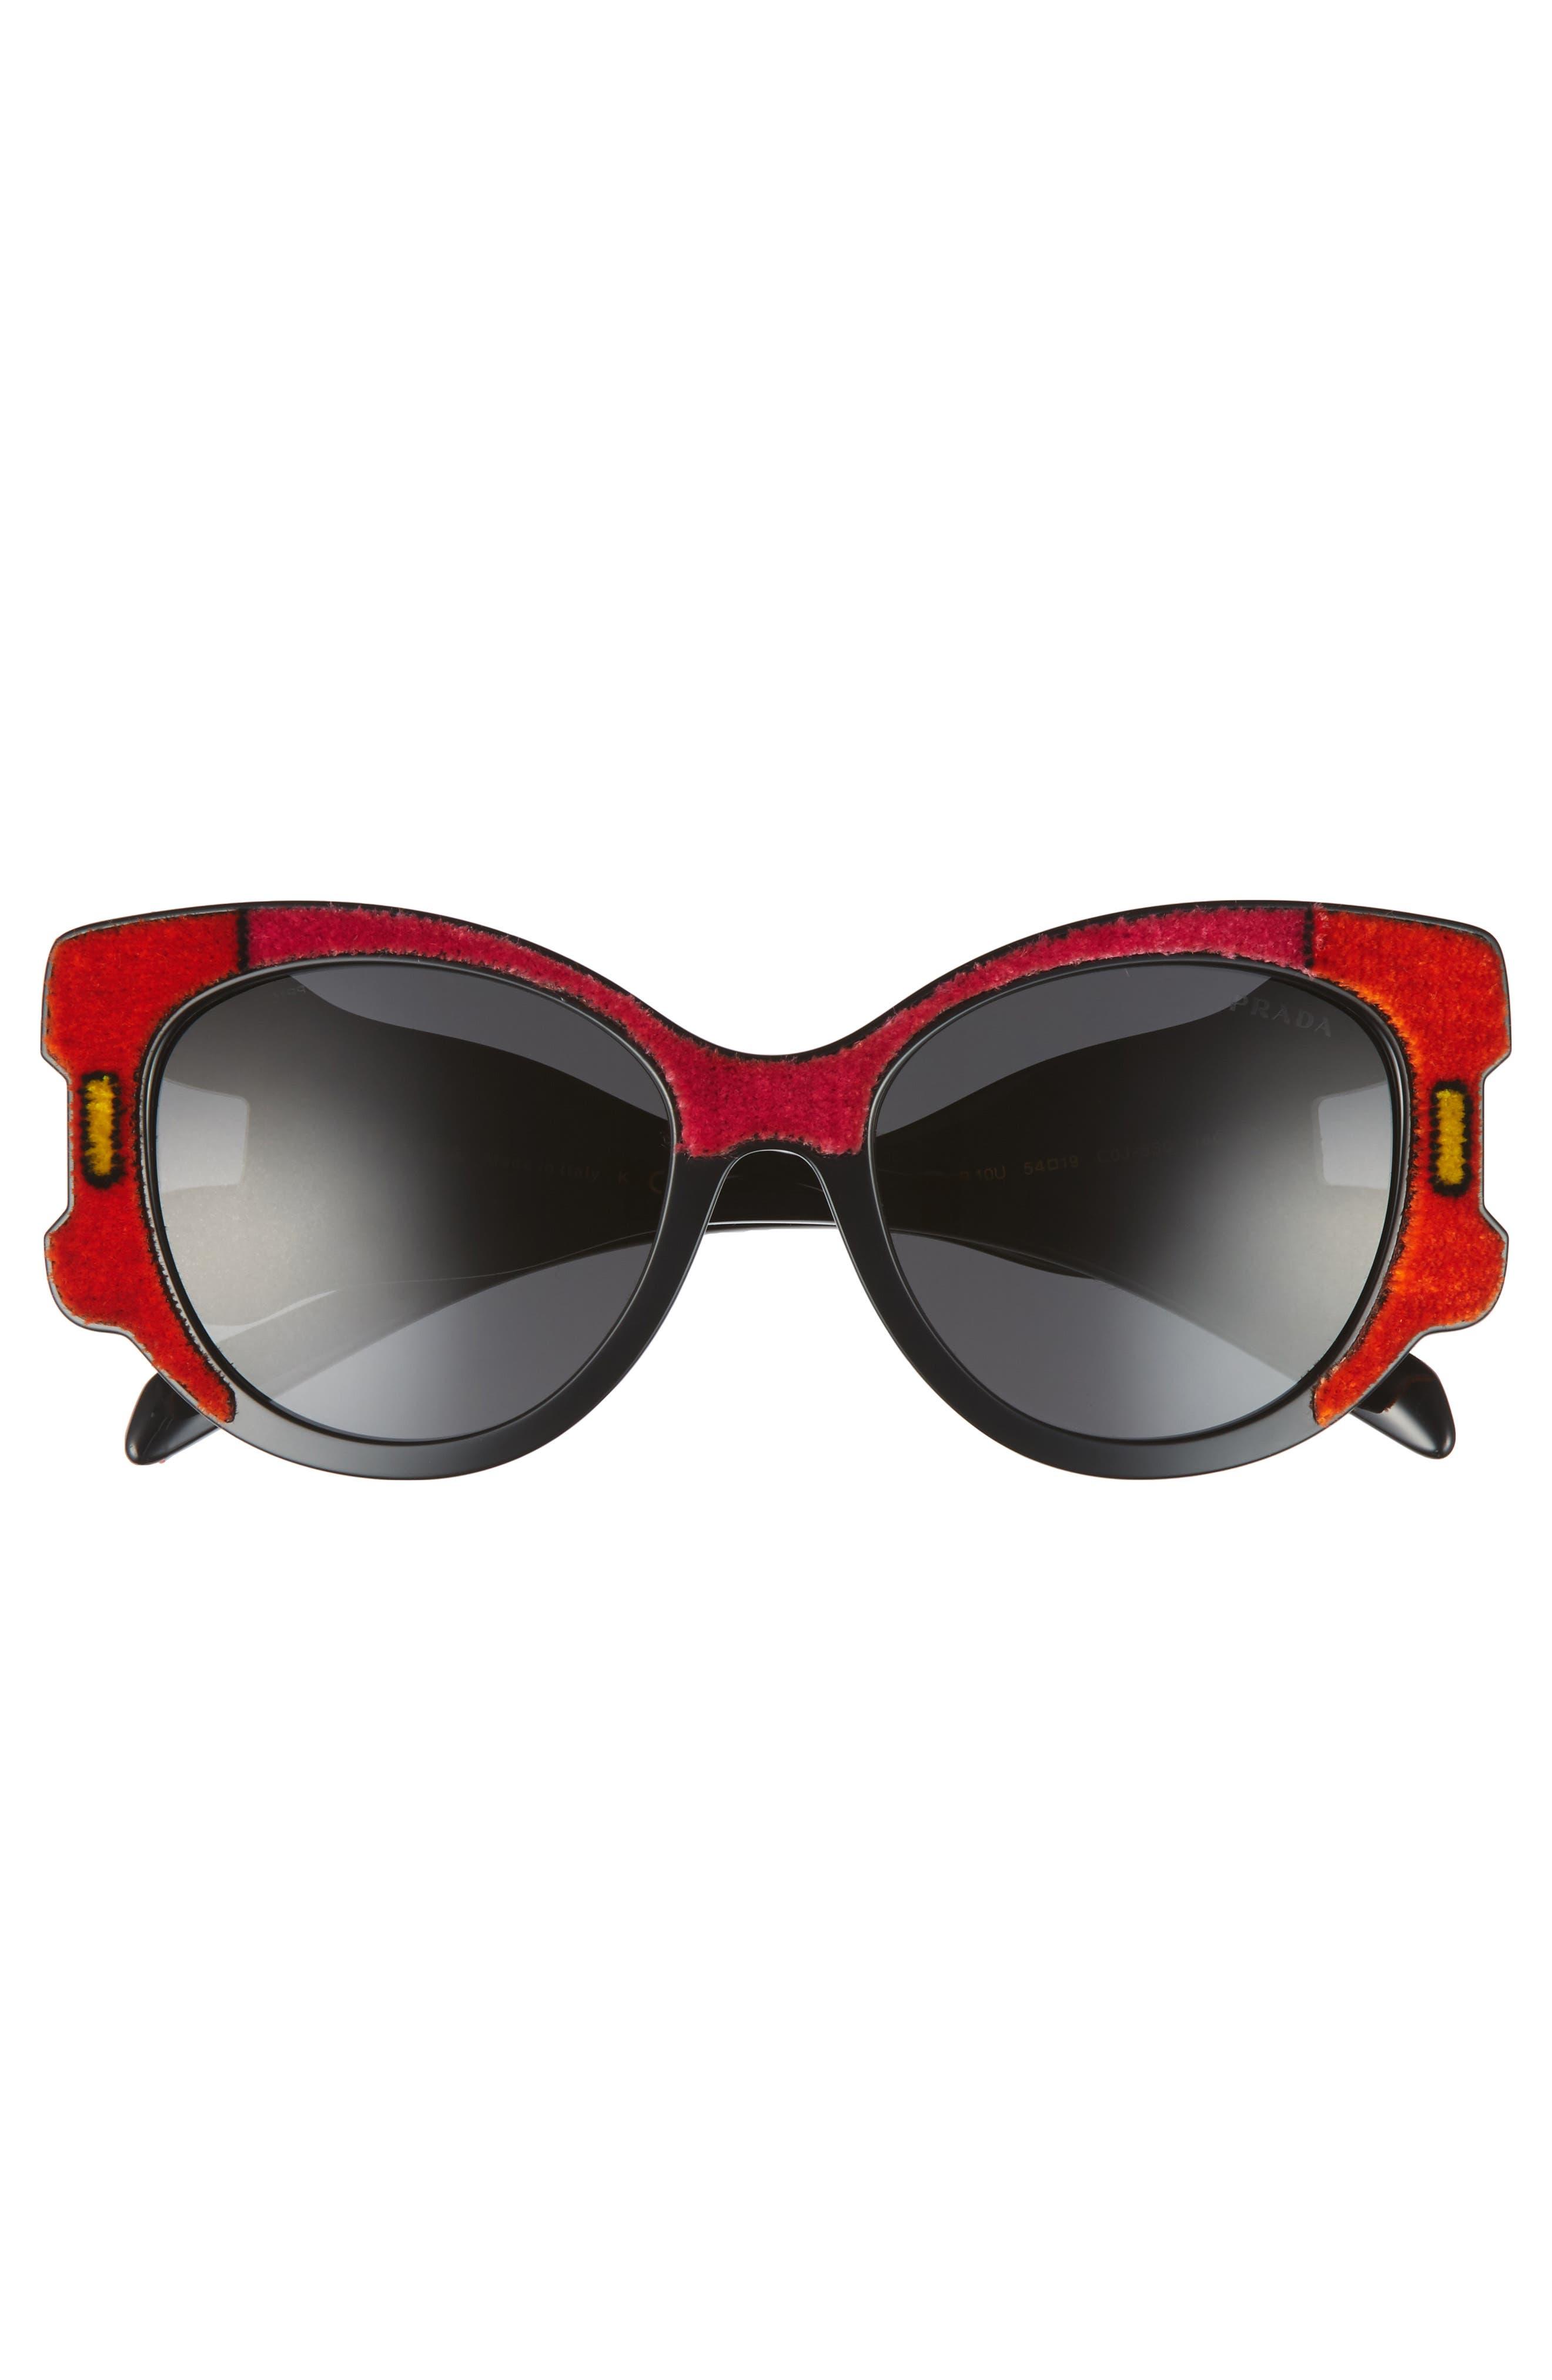 54mm Colorblock Round Sunglasses,                             Alternate thumbnail 4, color,                             010